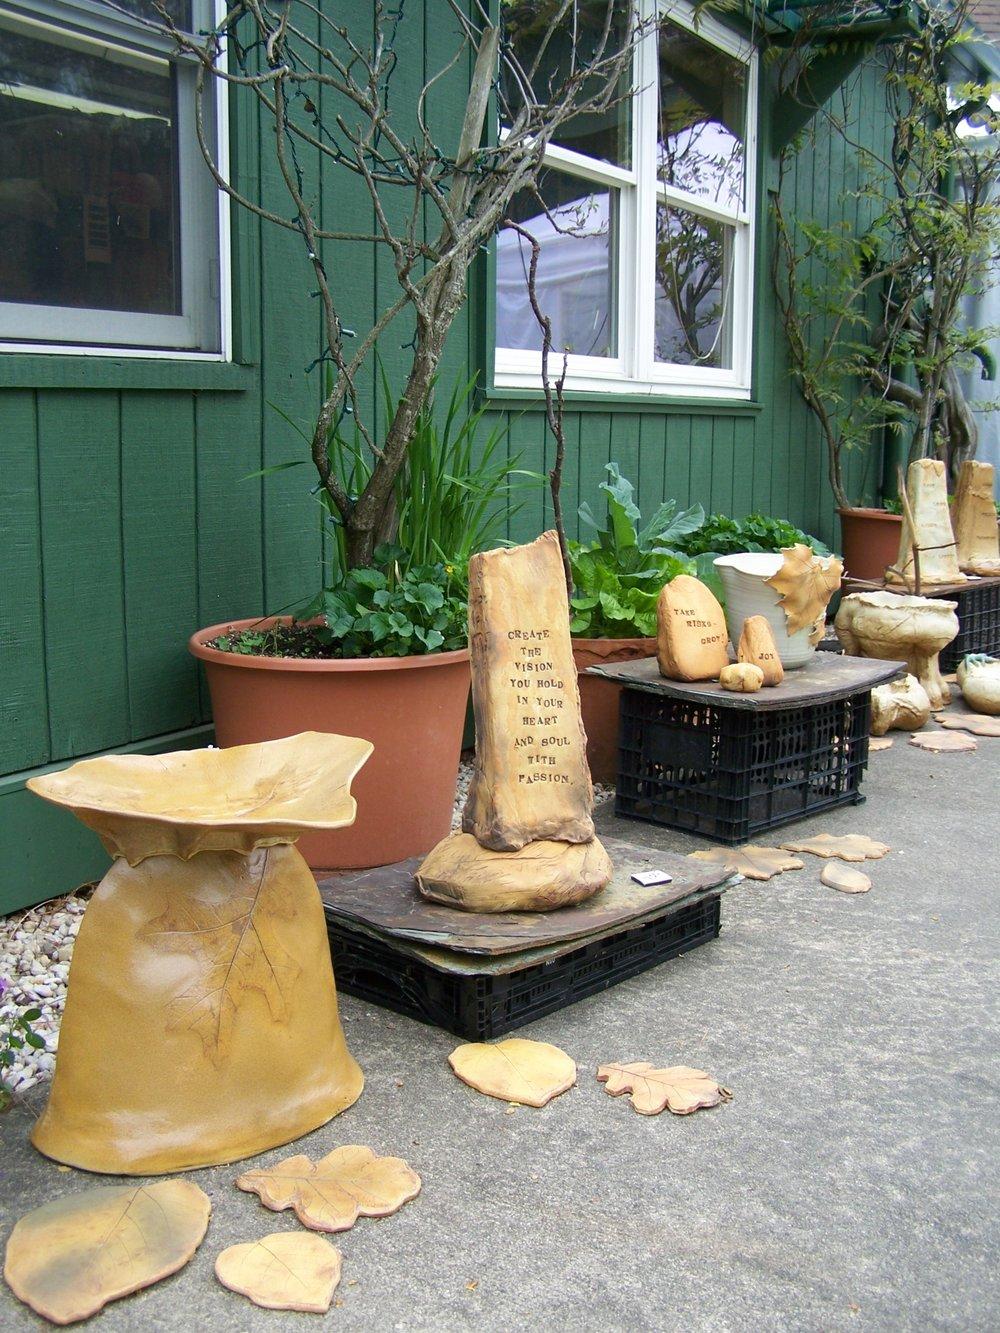 Kaaren StonerDesign Studio - One-of-a-Kind clay creationsfor the home and garden